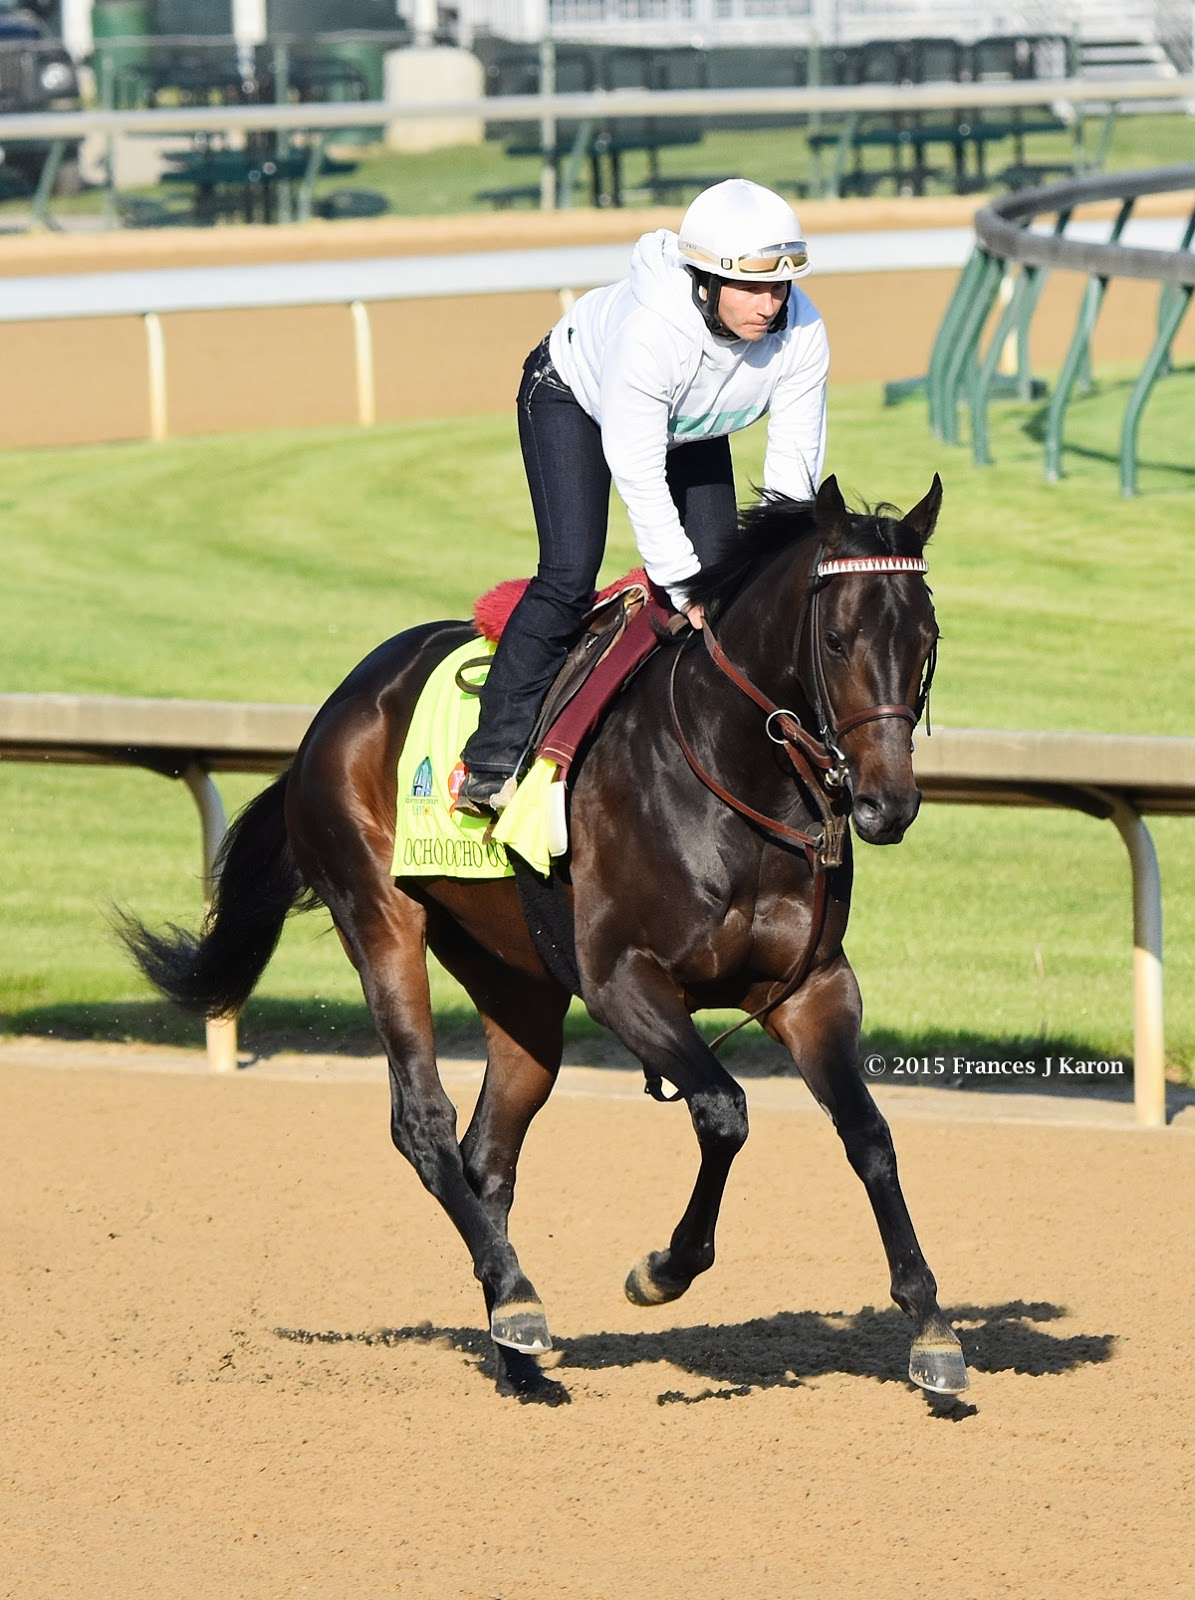 The Big Horse Sire, Tiznow, | Thoroughbred horse racing, Horses, Big horses